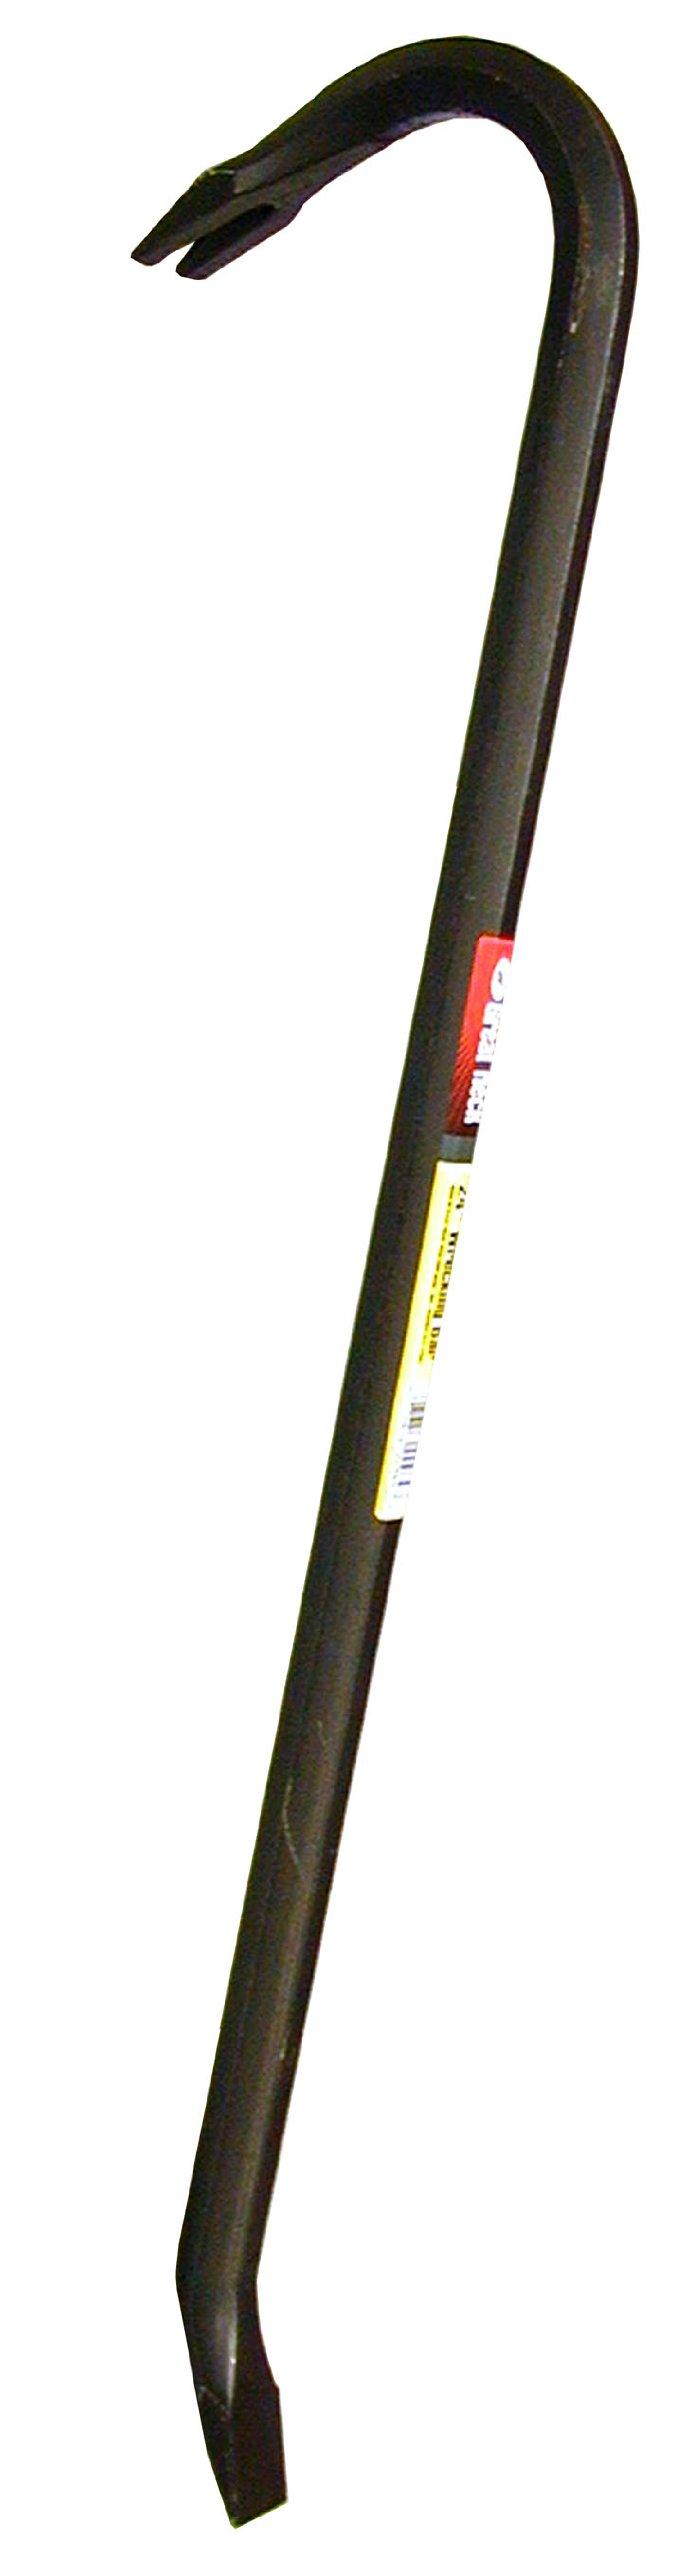 GreatNeck WR36 Wrecking Bar, 36 Inch